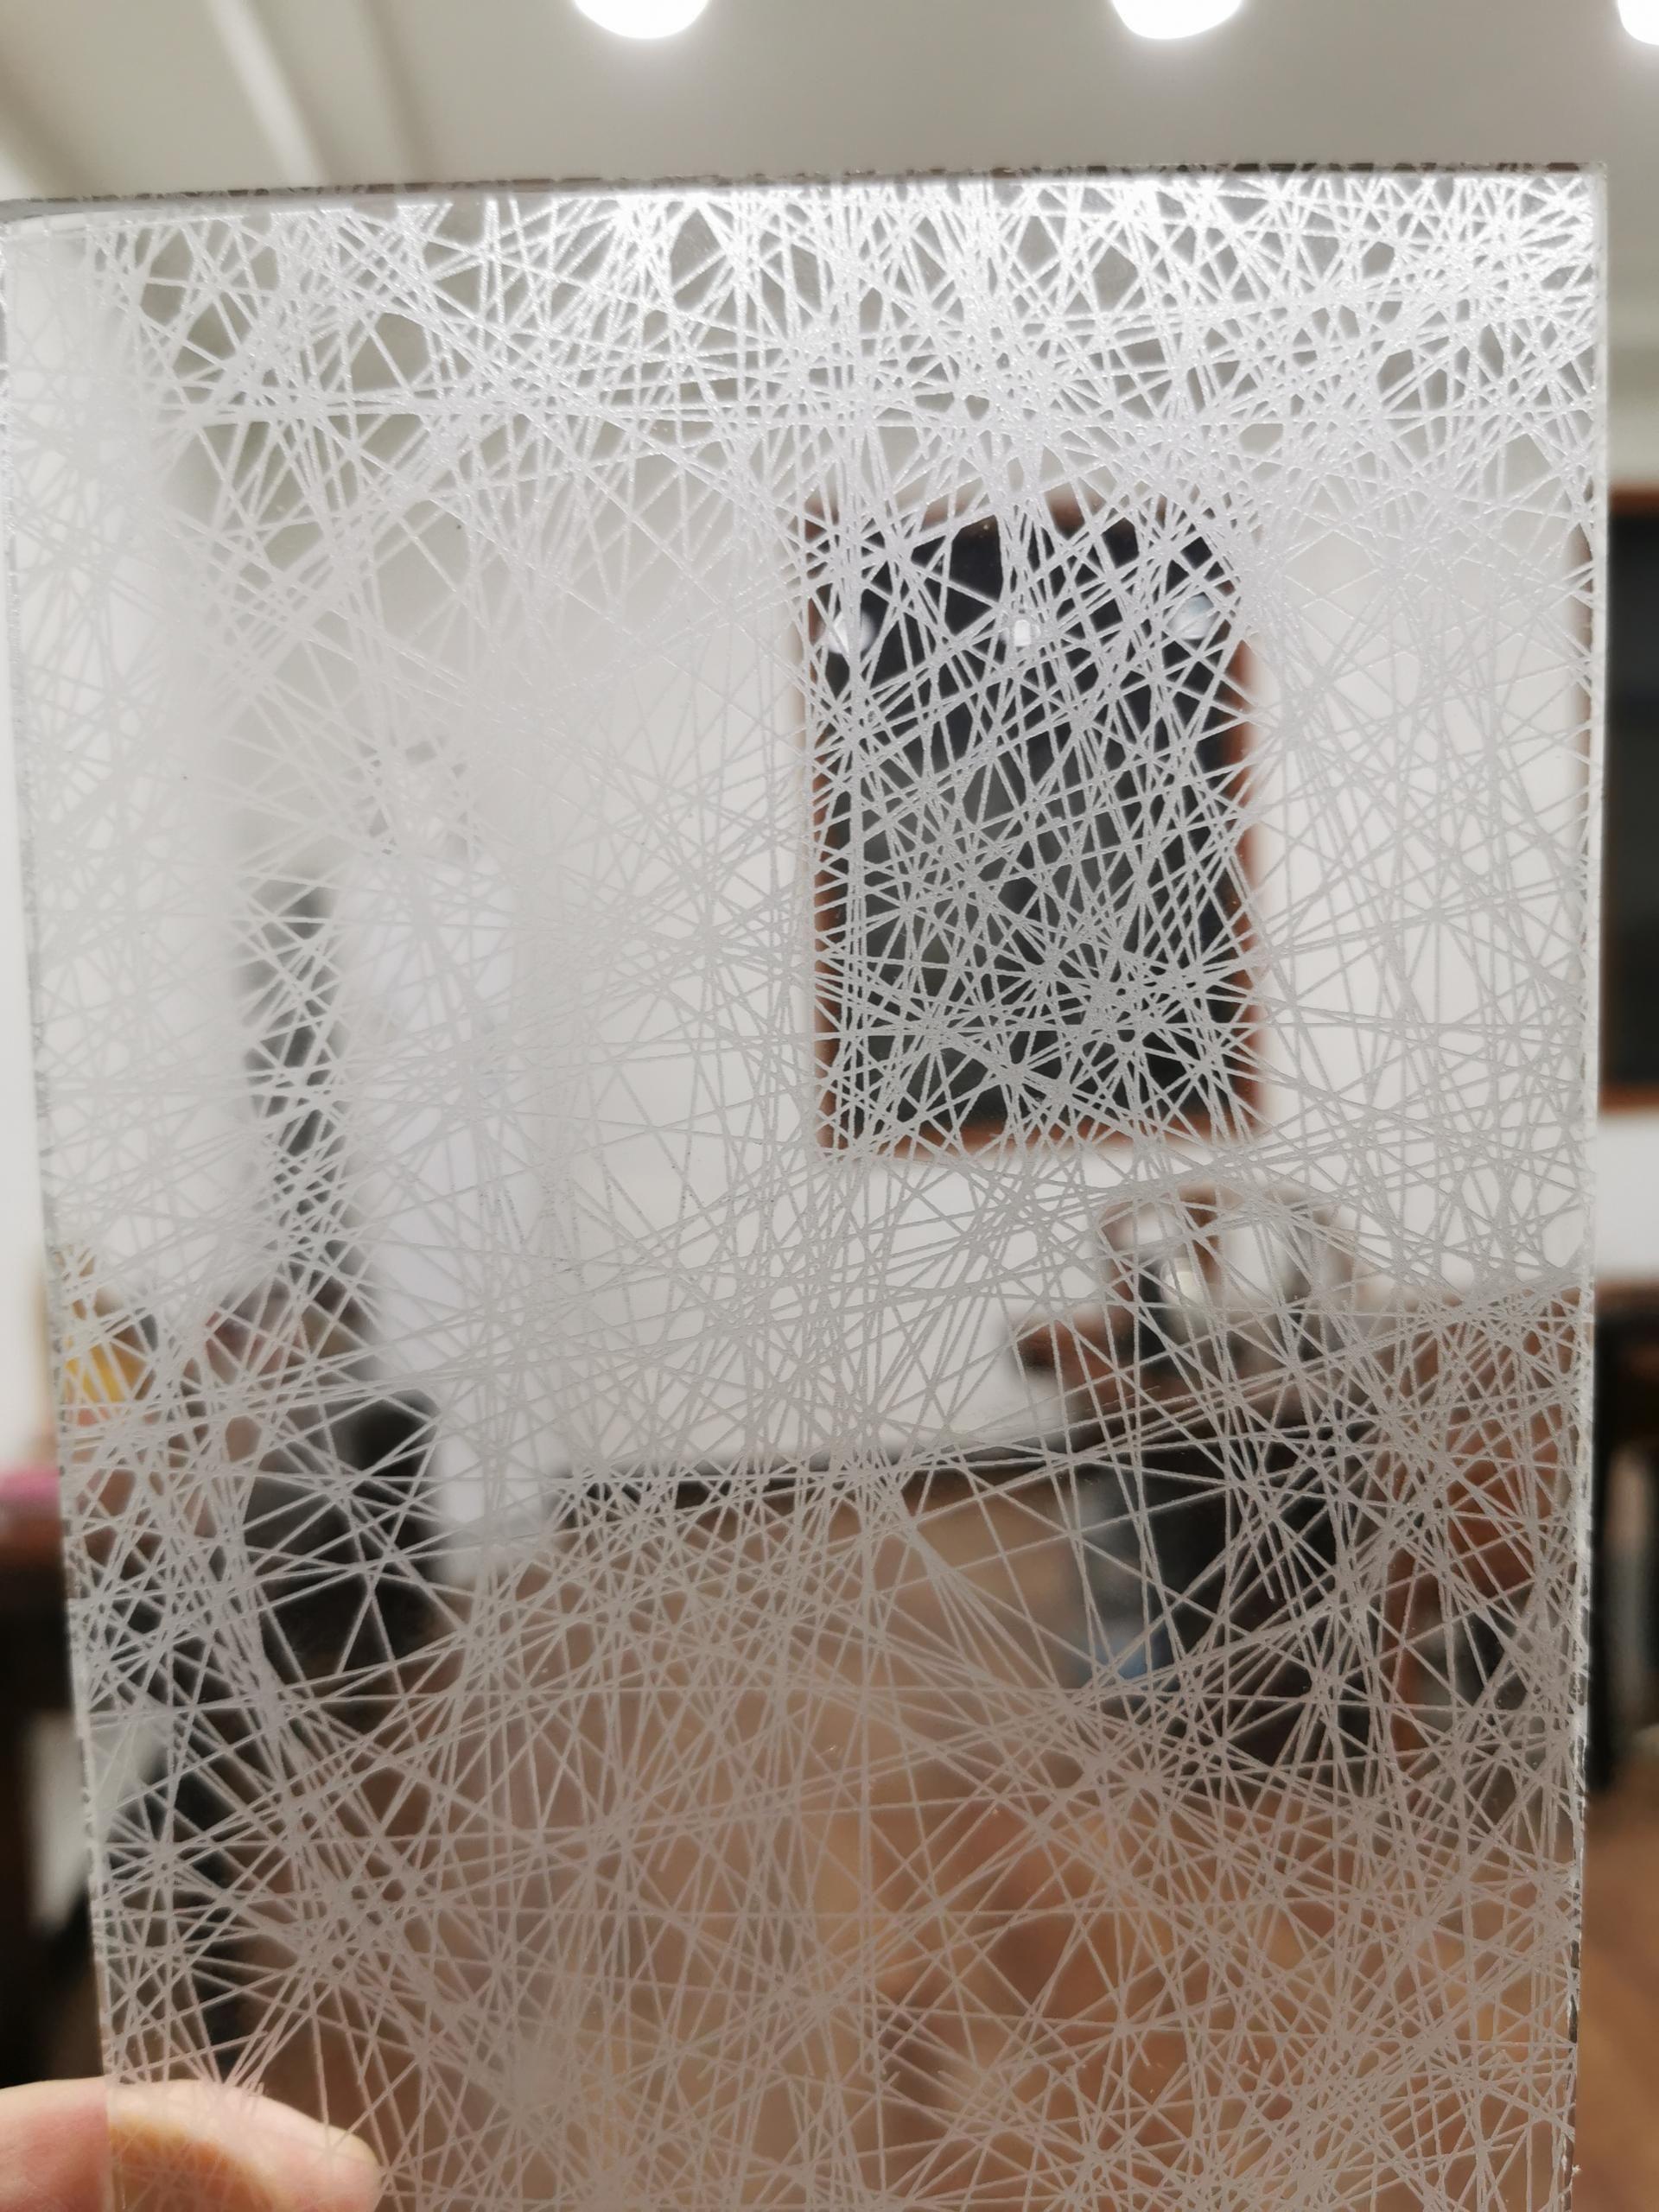 Temperable Decorative Glass In 2020 Glass Decor Glass Shower Doors Decor